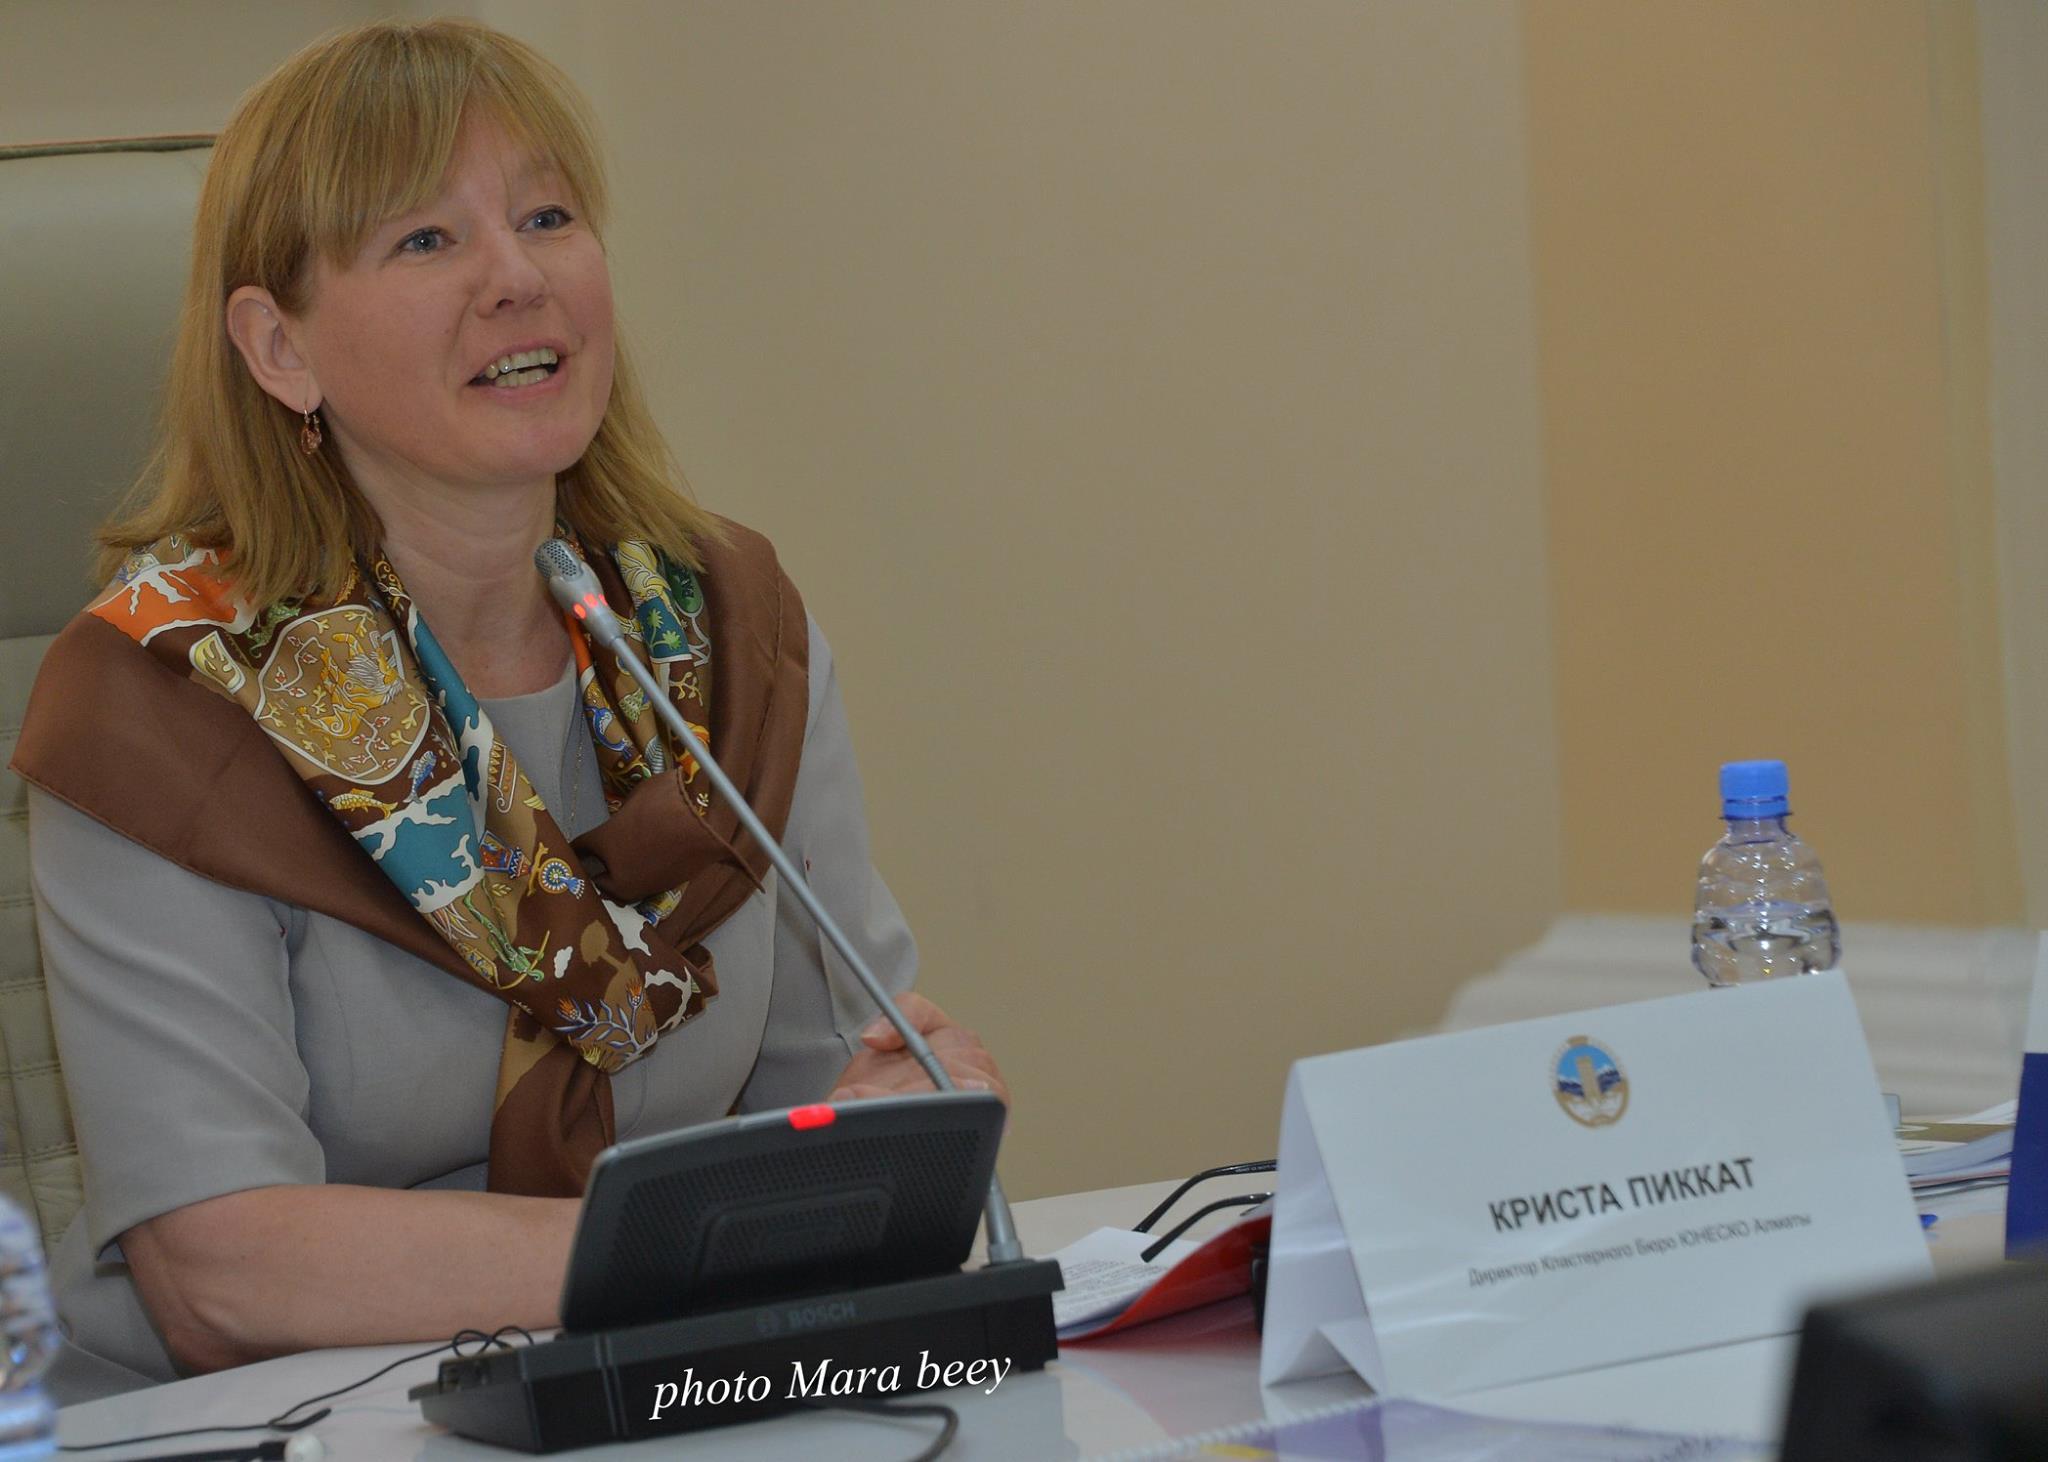 Welcome from Krista Pikkat, UNESCO representative to Kazakhstan, Kyrgyzstan and Tajikistan ©Marat Zhunisbekov